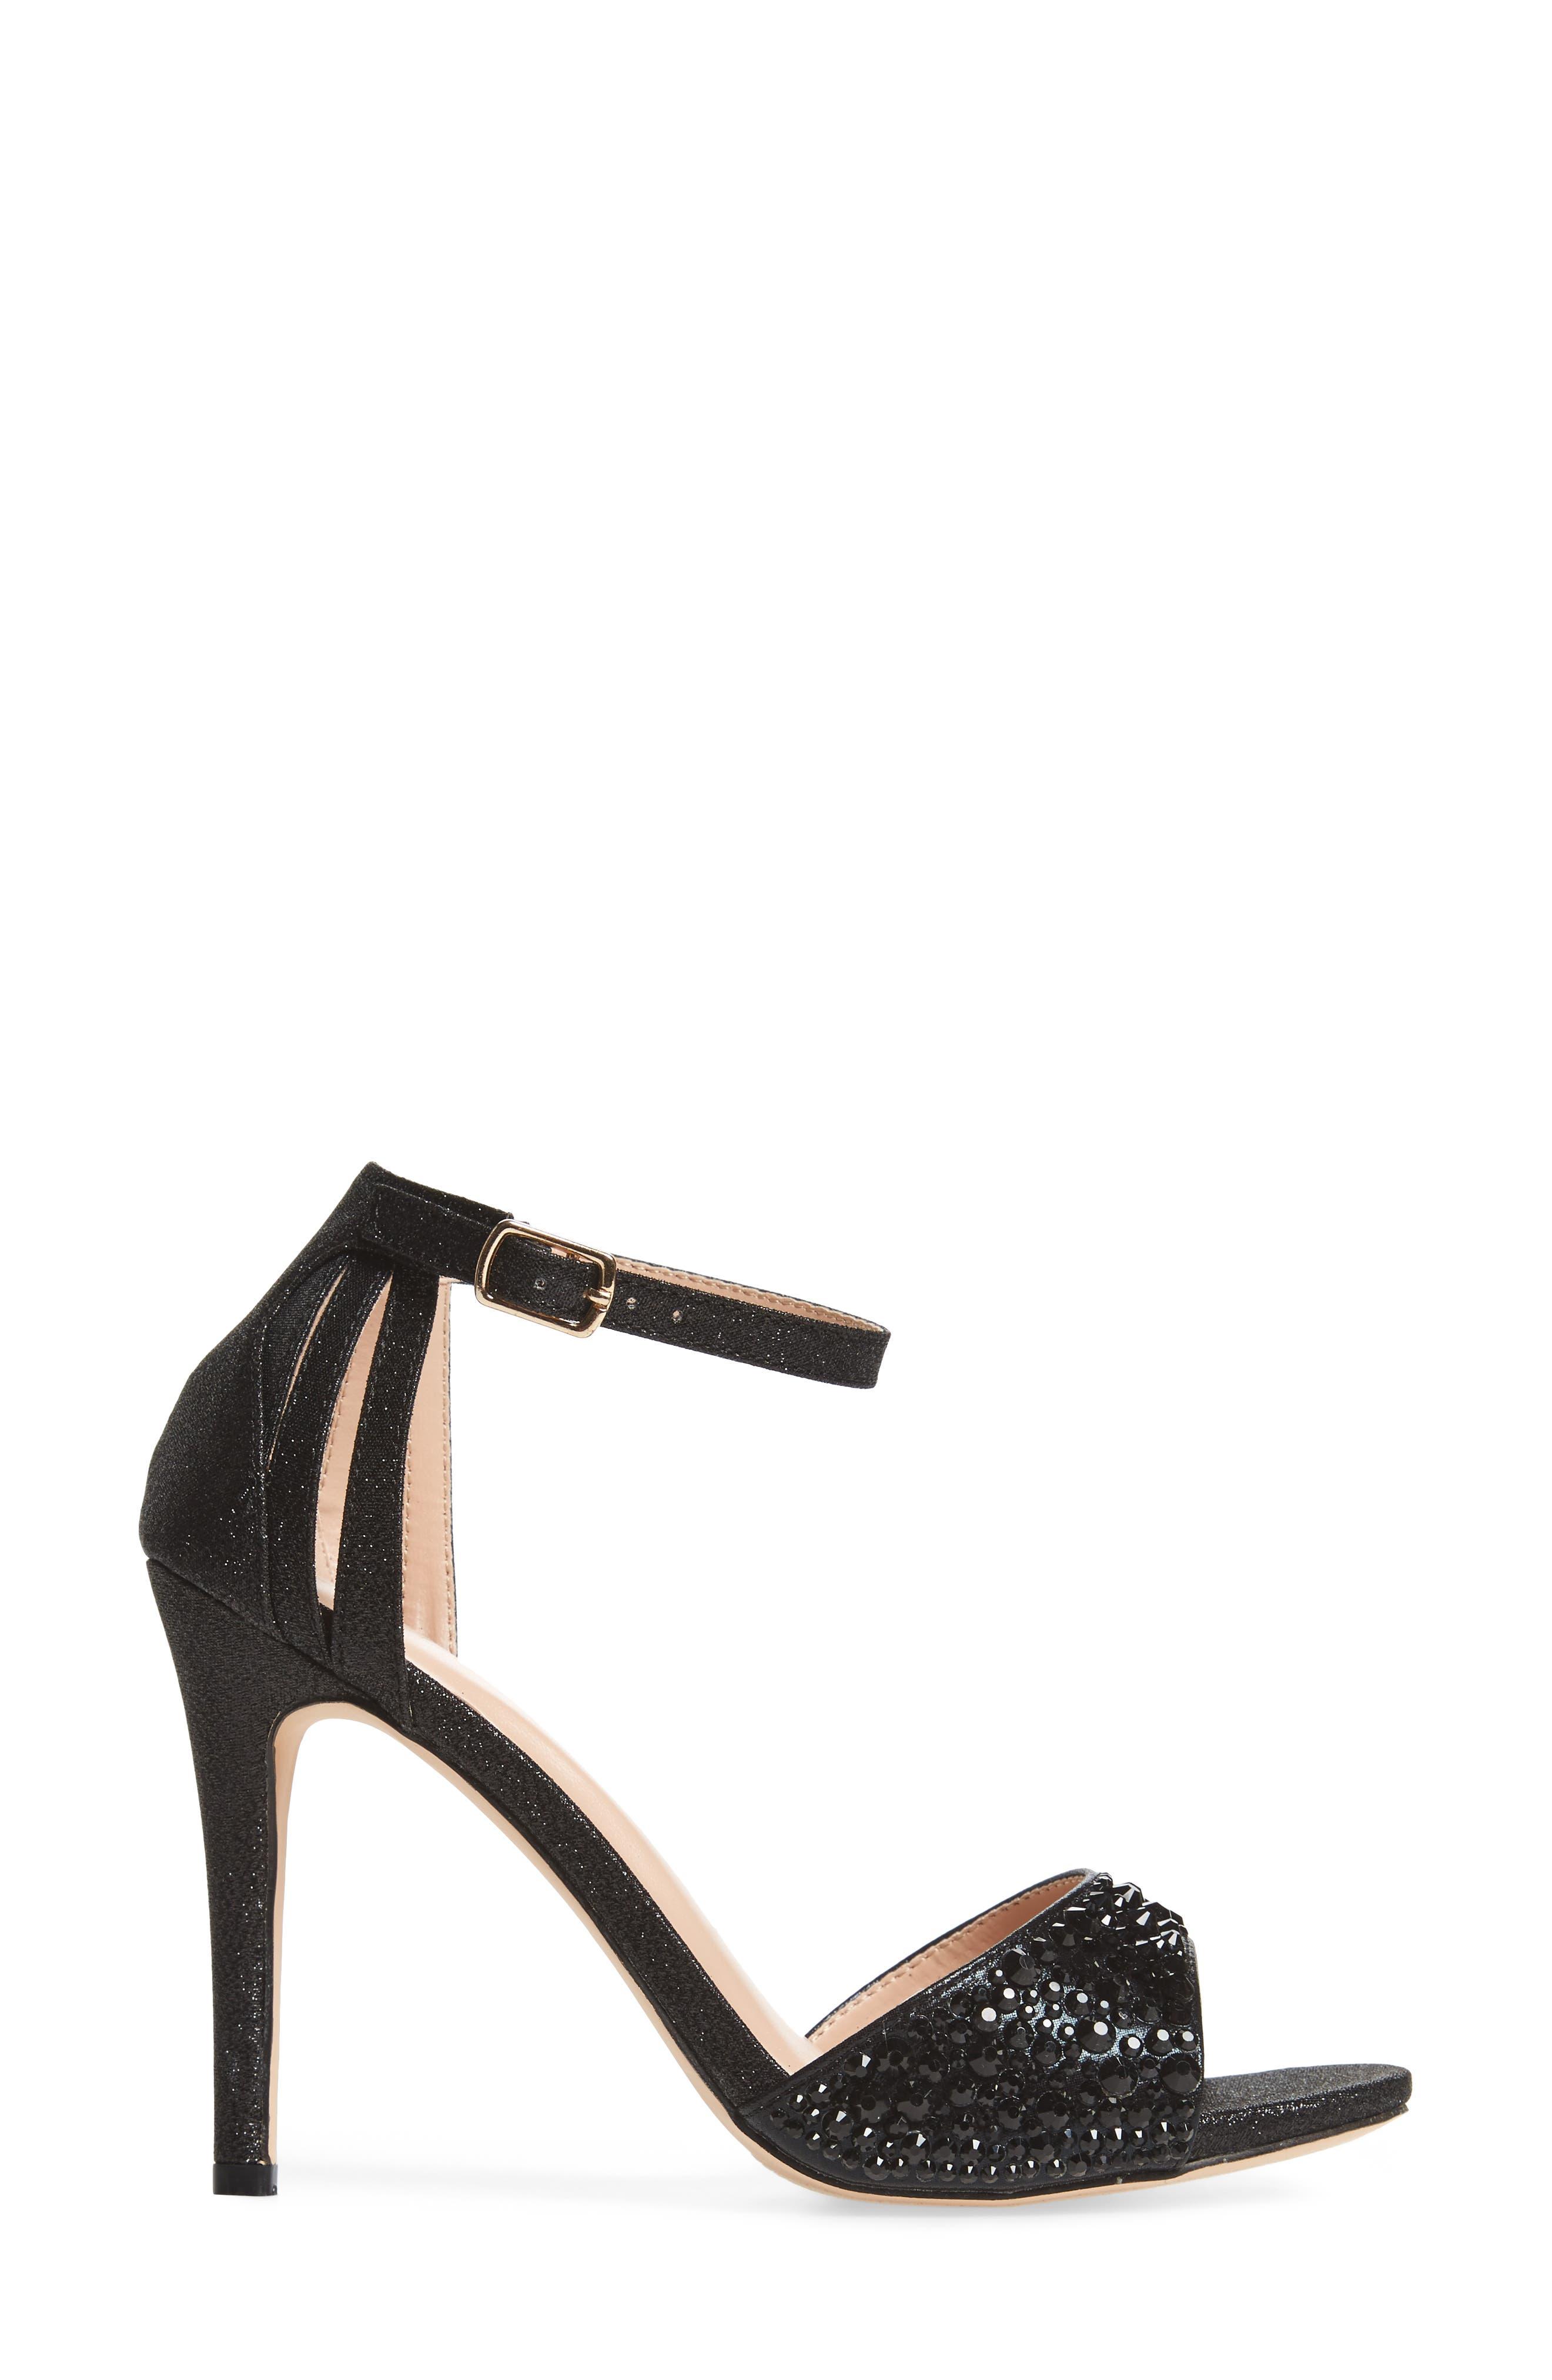 Alternate Image 3  - Lauren Lorraine Maddy Embellished Sandal (Women)